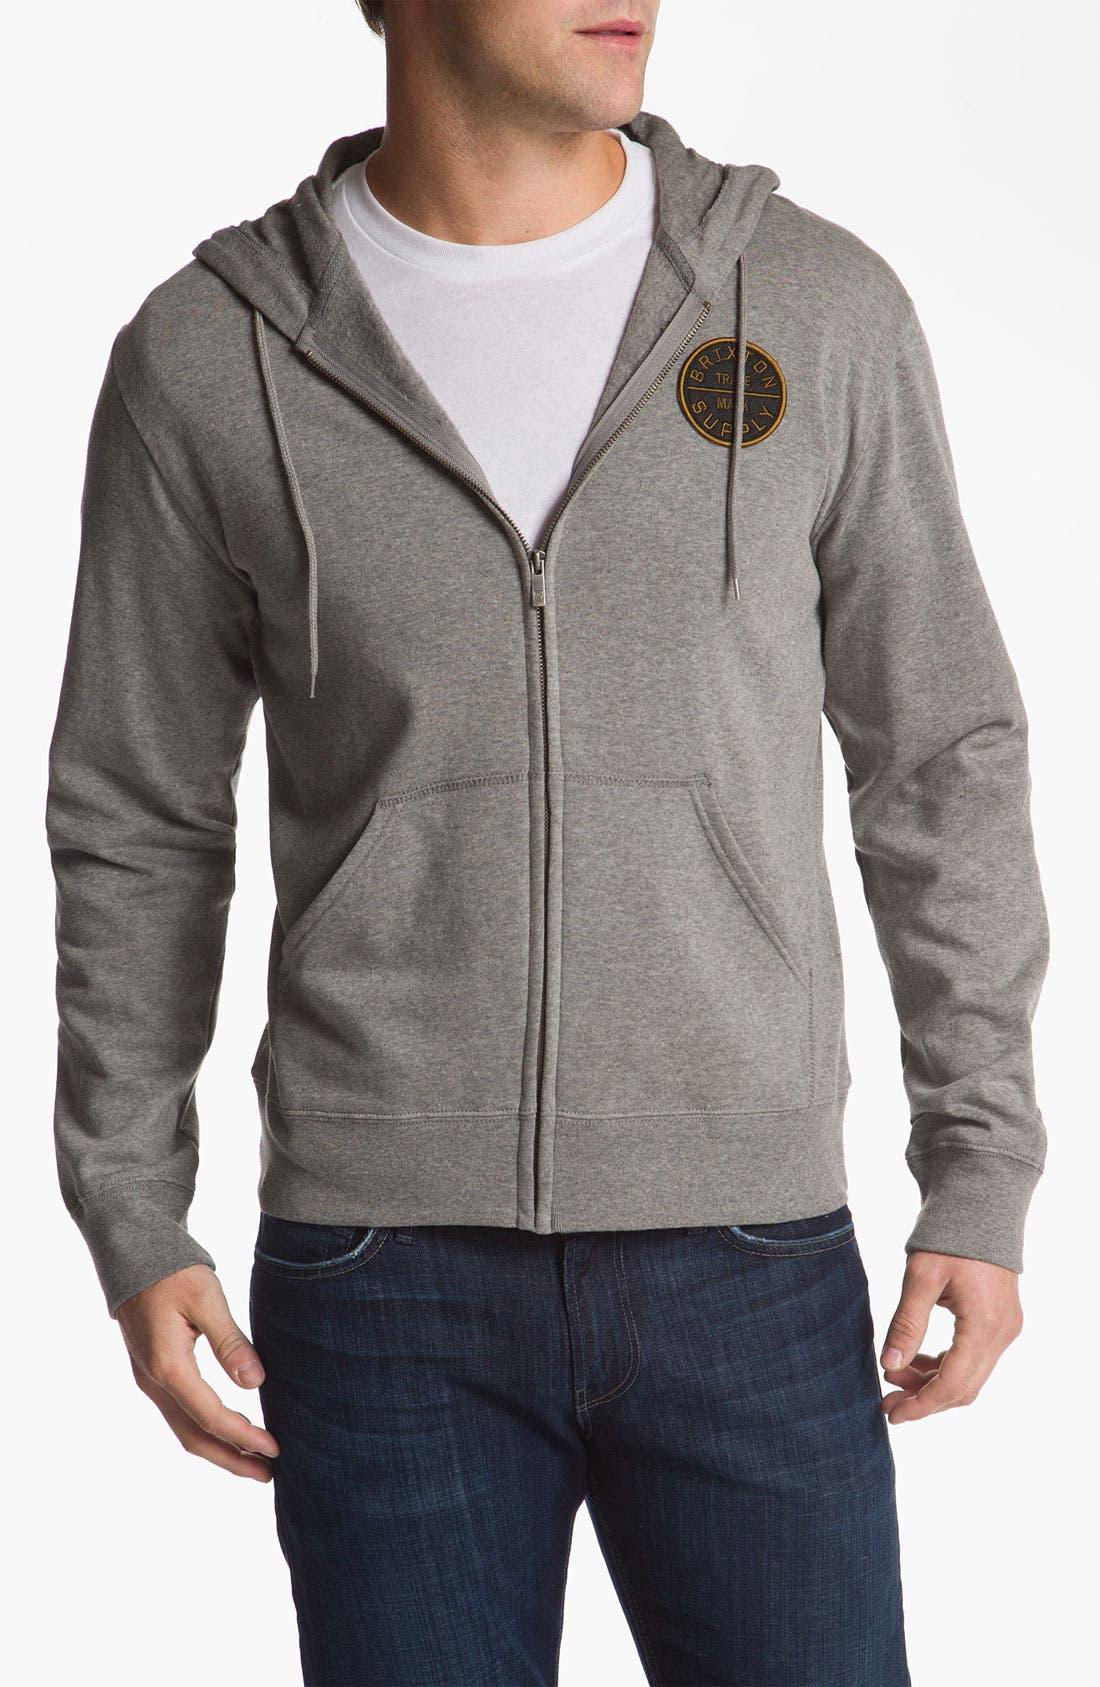 Alternate Image 1 Selected - Brixton 'Civil' Hooded Zip Front Sweatshirt